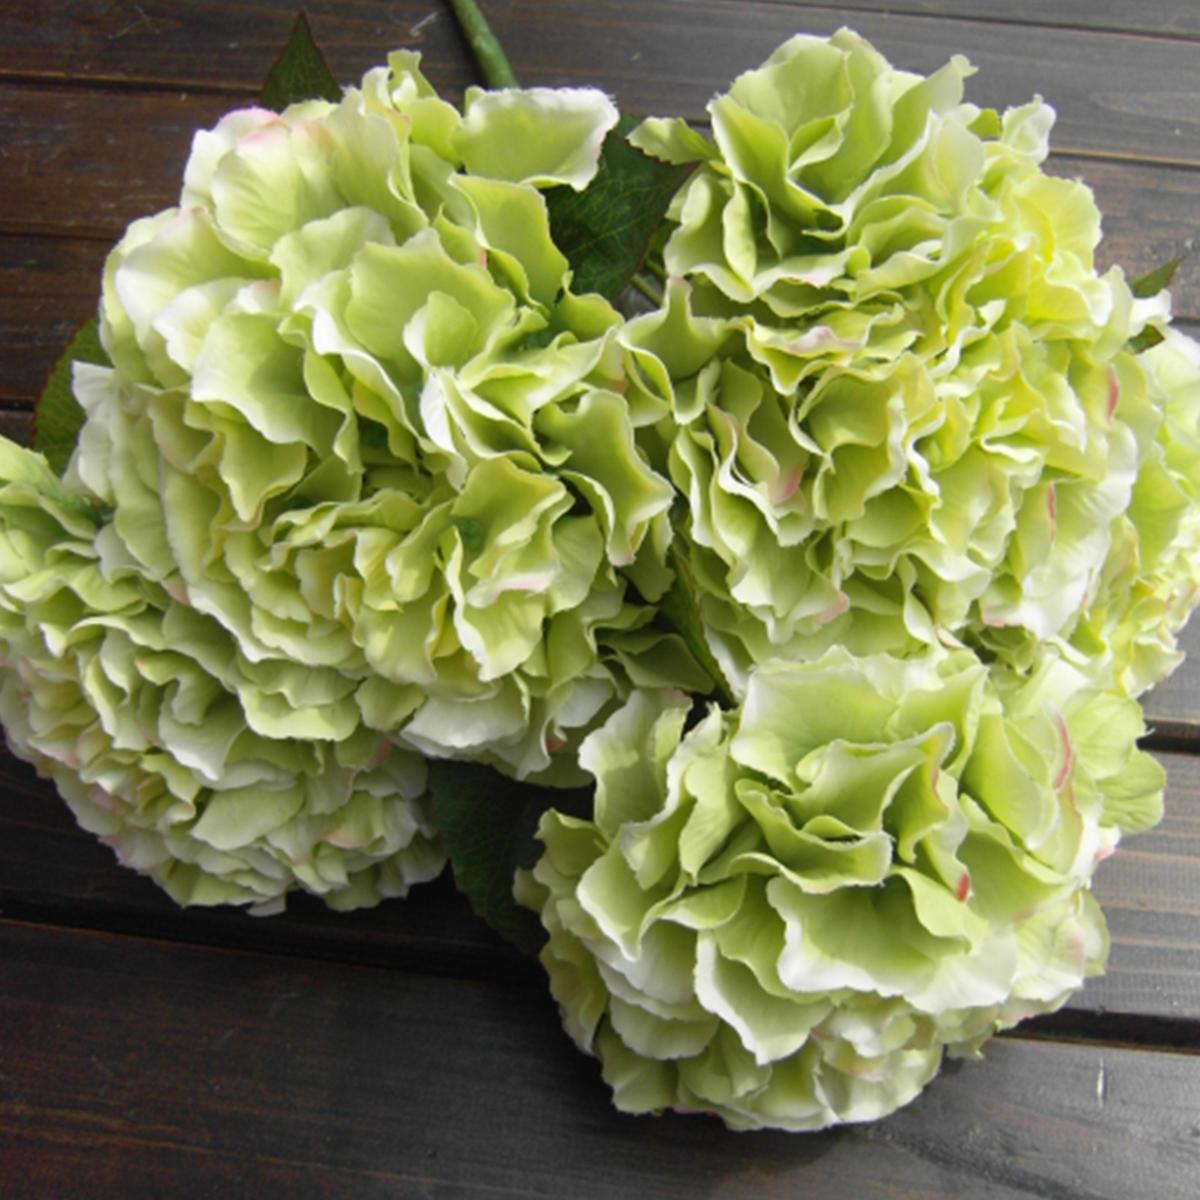 Green artificial silk hydrangea 5 flower heads bouquet home wedding decor craft - Nature curiosity stressed out plants emit animal like signals ...